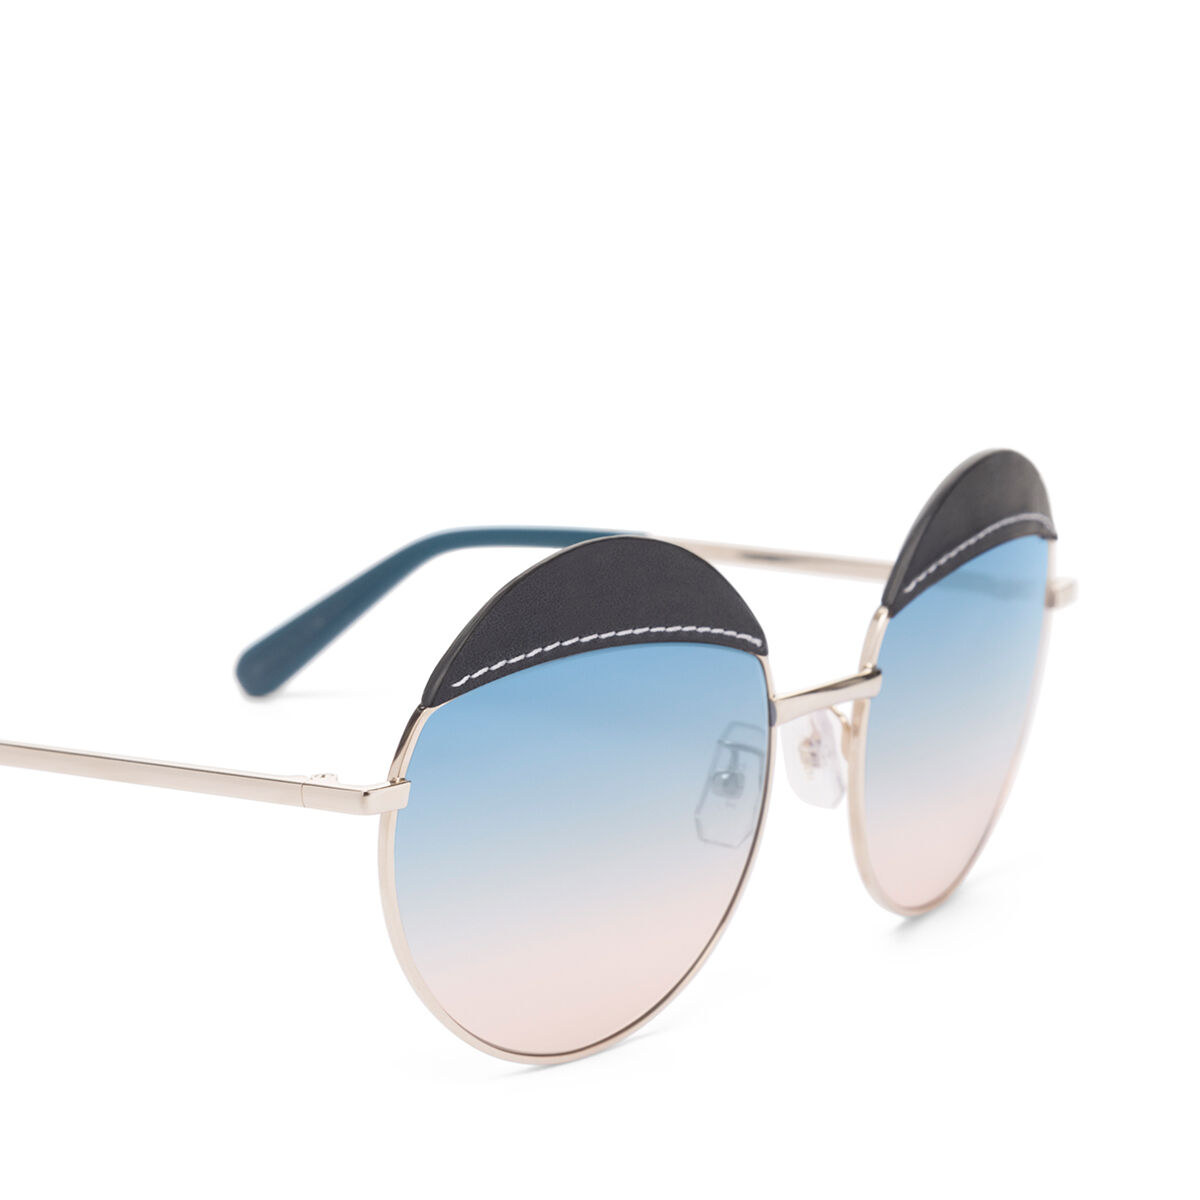 LOEWE Gafas Redondas Pespunte Azul/Azul Degradado Melocoton all